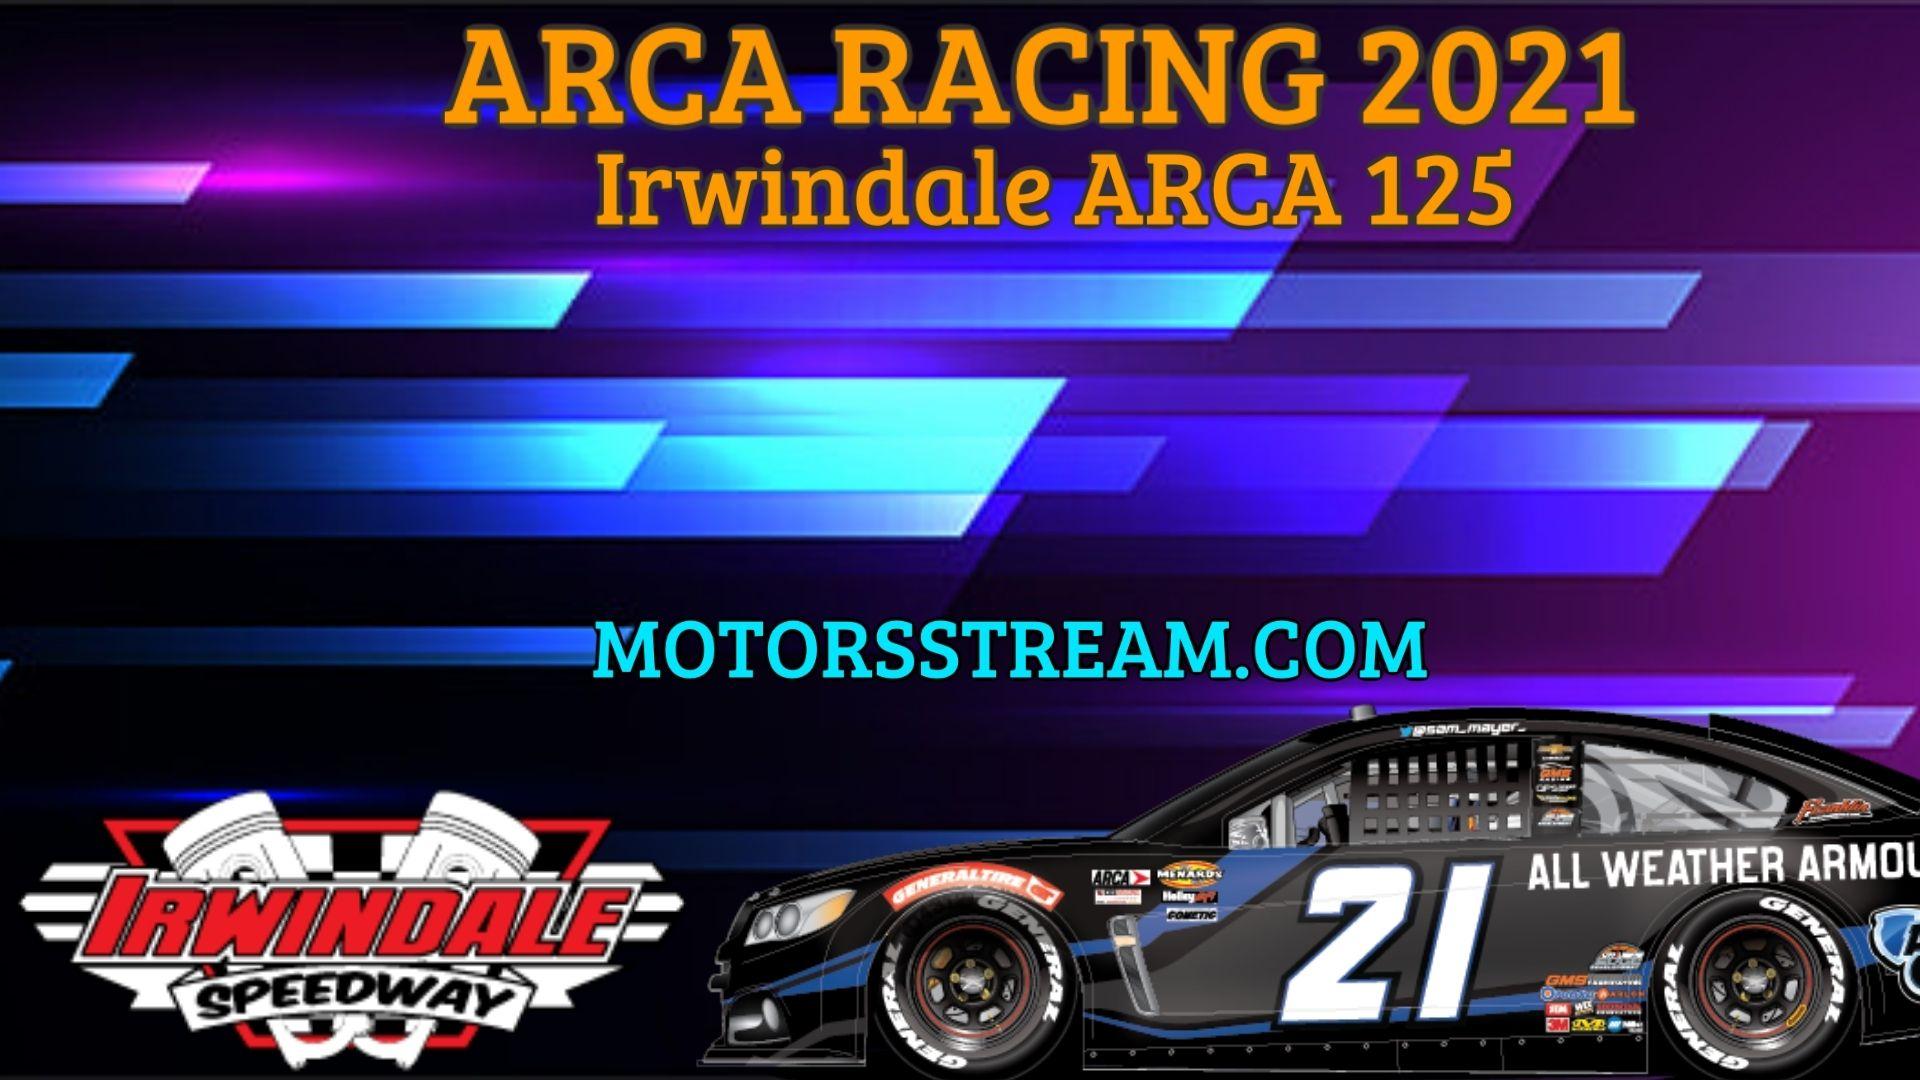 NAPA Auto Parts 150 Live Stream 2021 Arca Racing